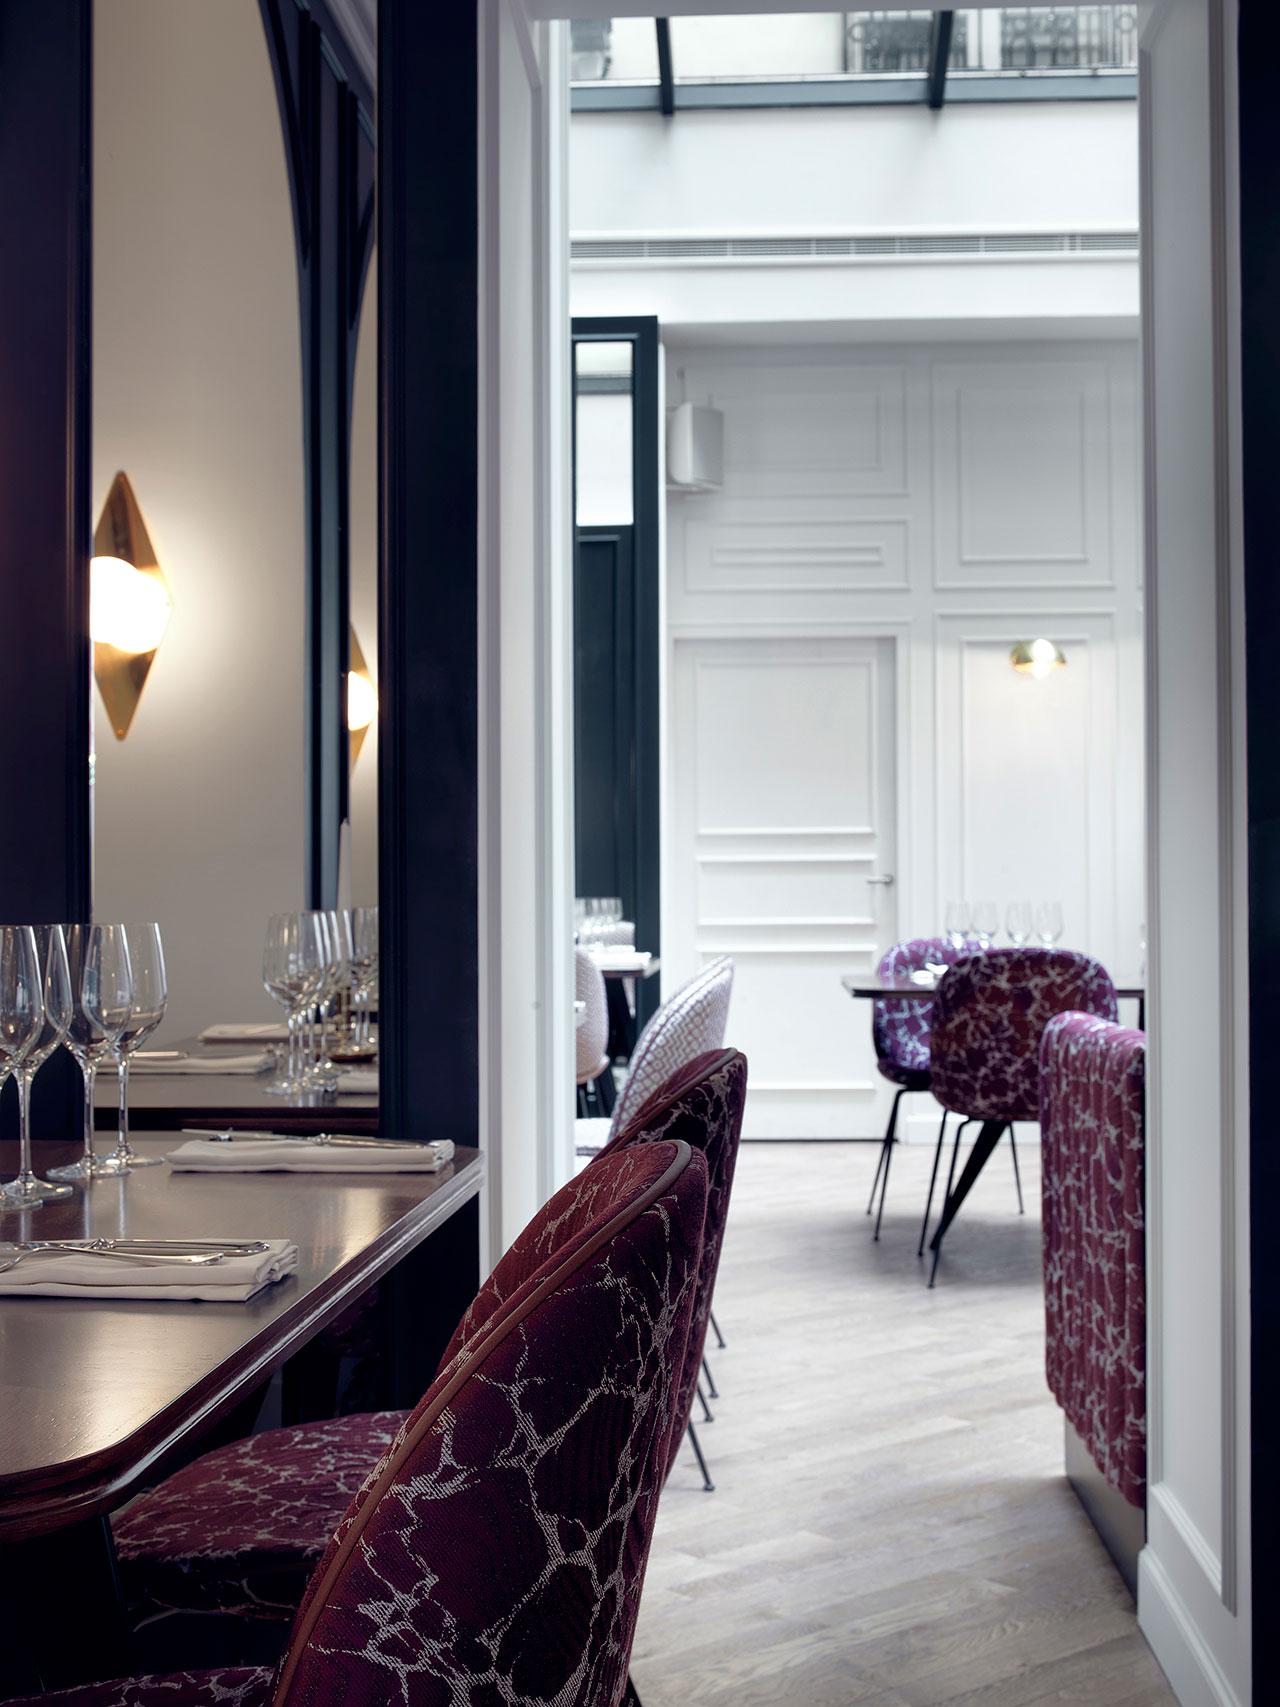 Art Deco Thrills at Hotel Bachaumont Paris